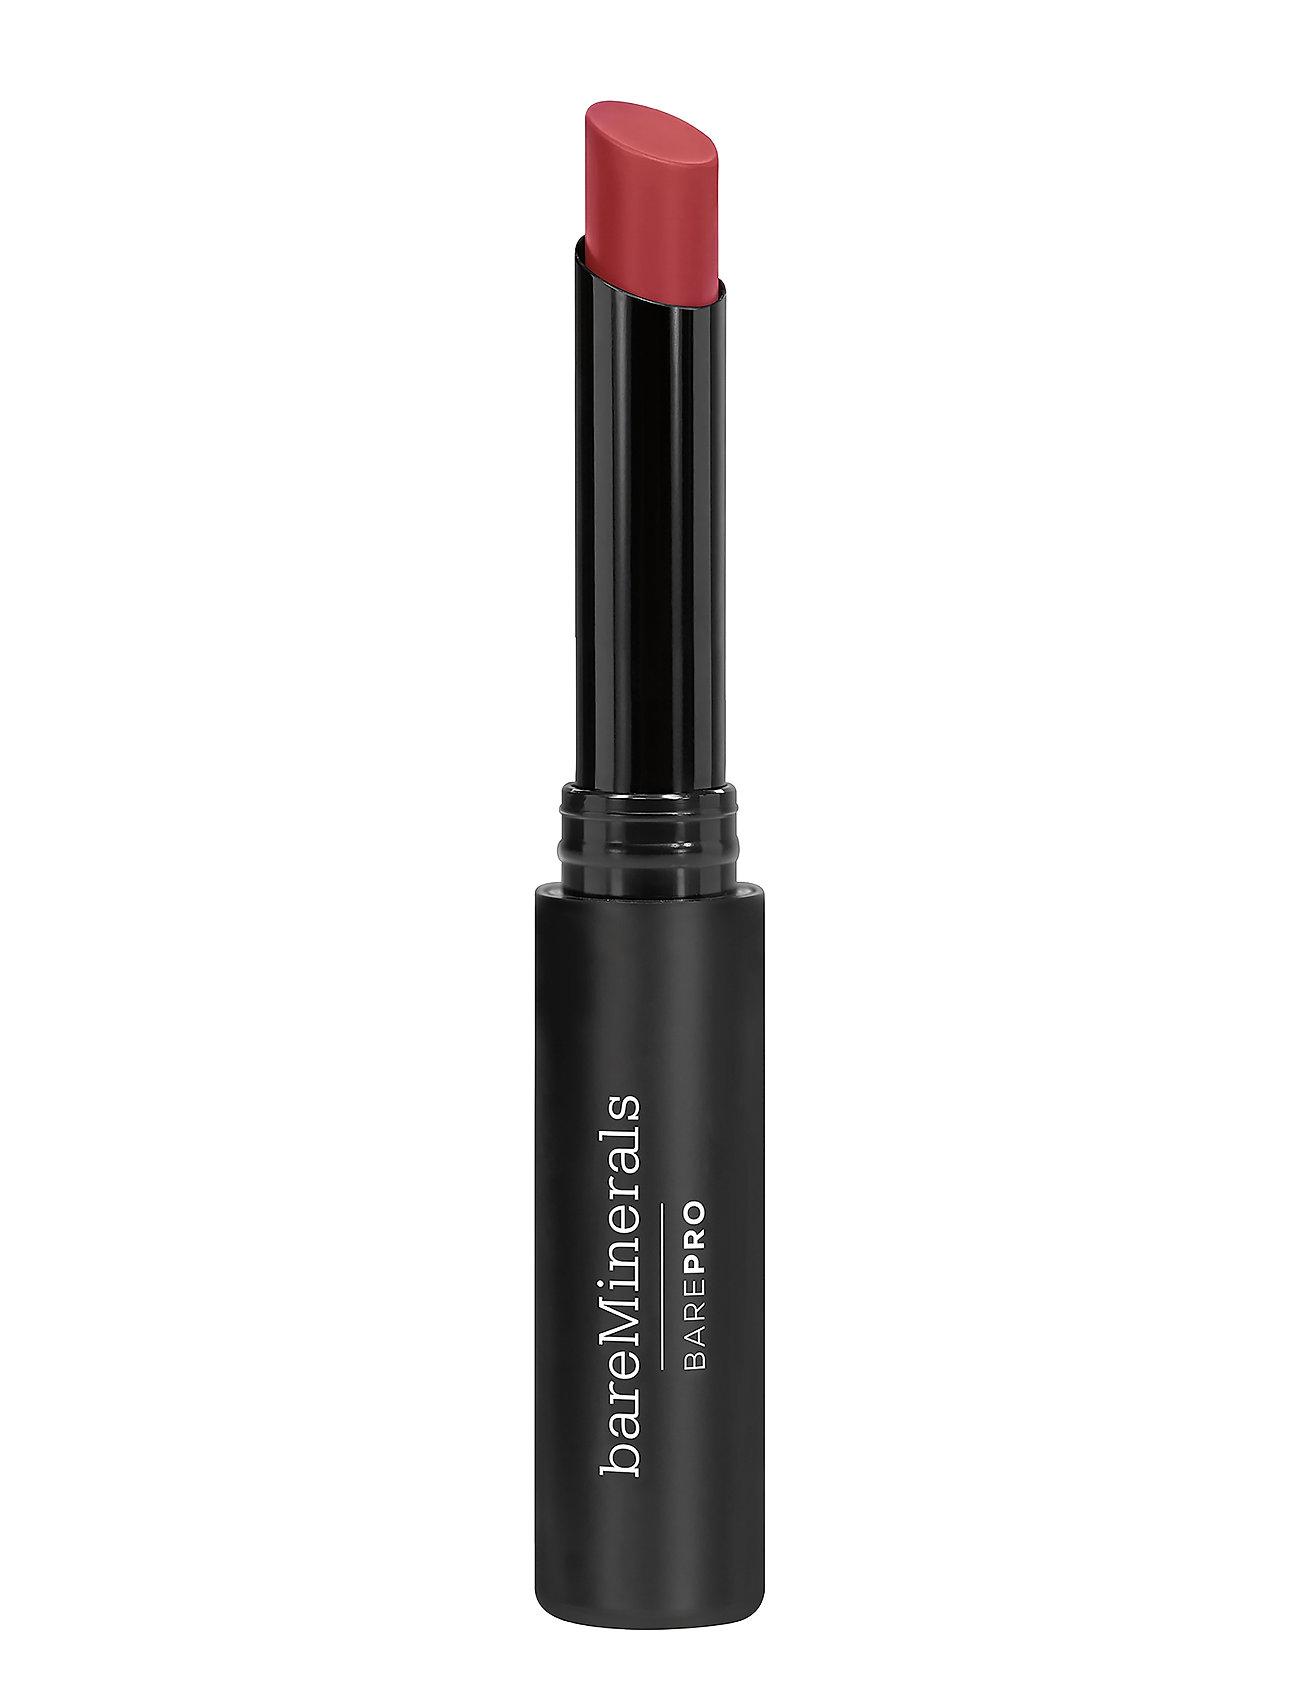 Image of Barepro Longwear Lipstick Geranium Læbestift Makeup Lyserød BareMinerals (3138616961)